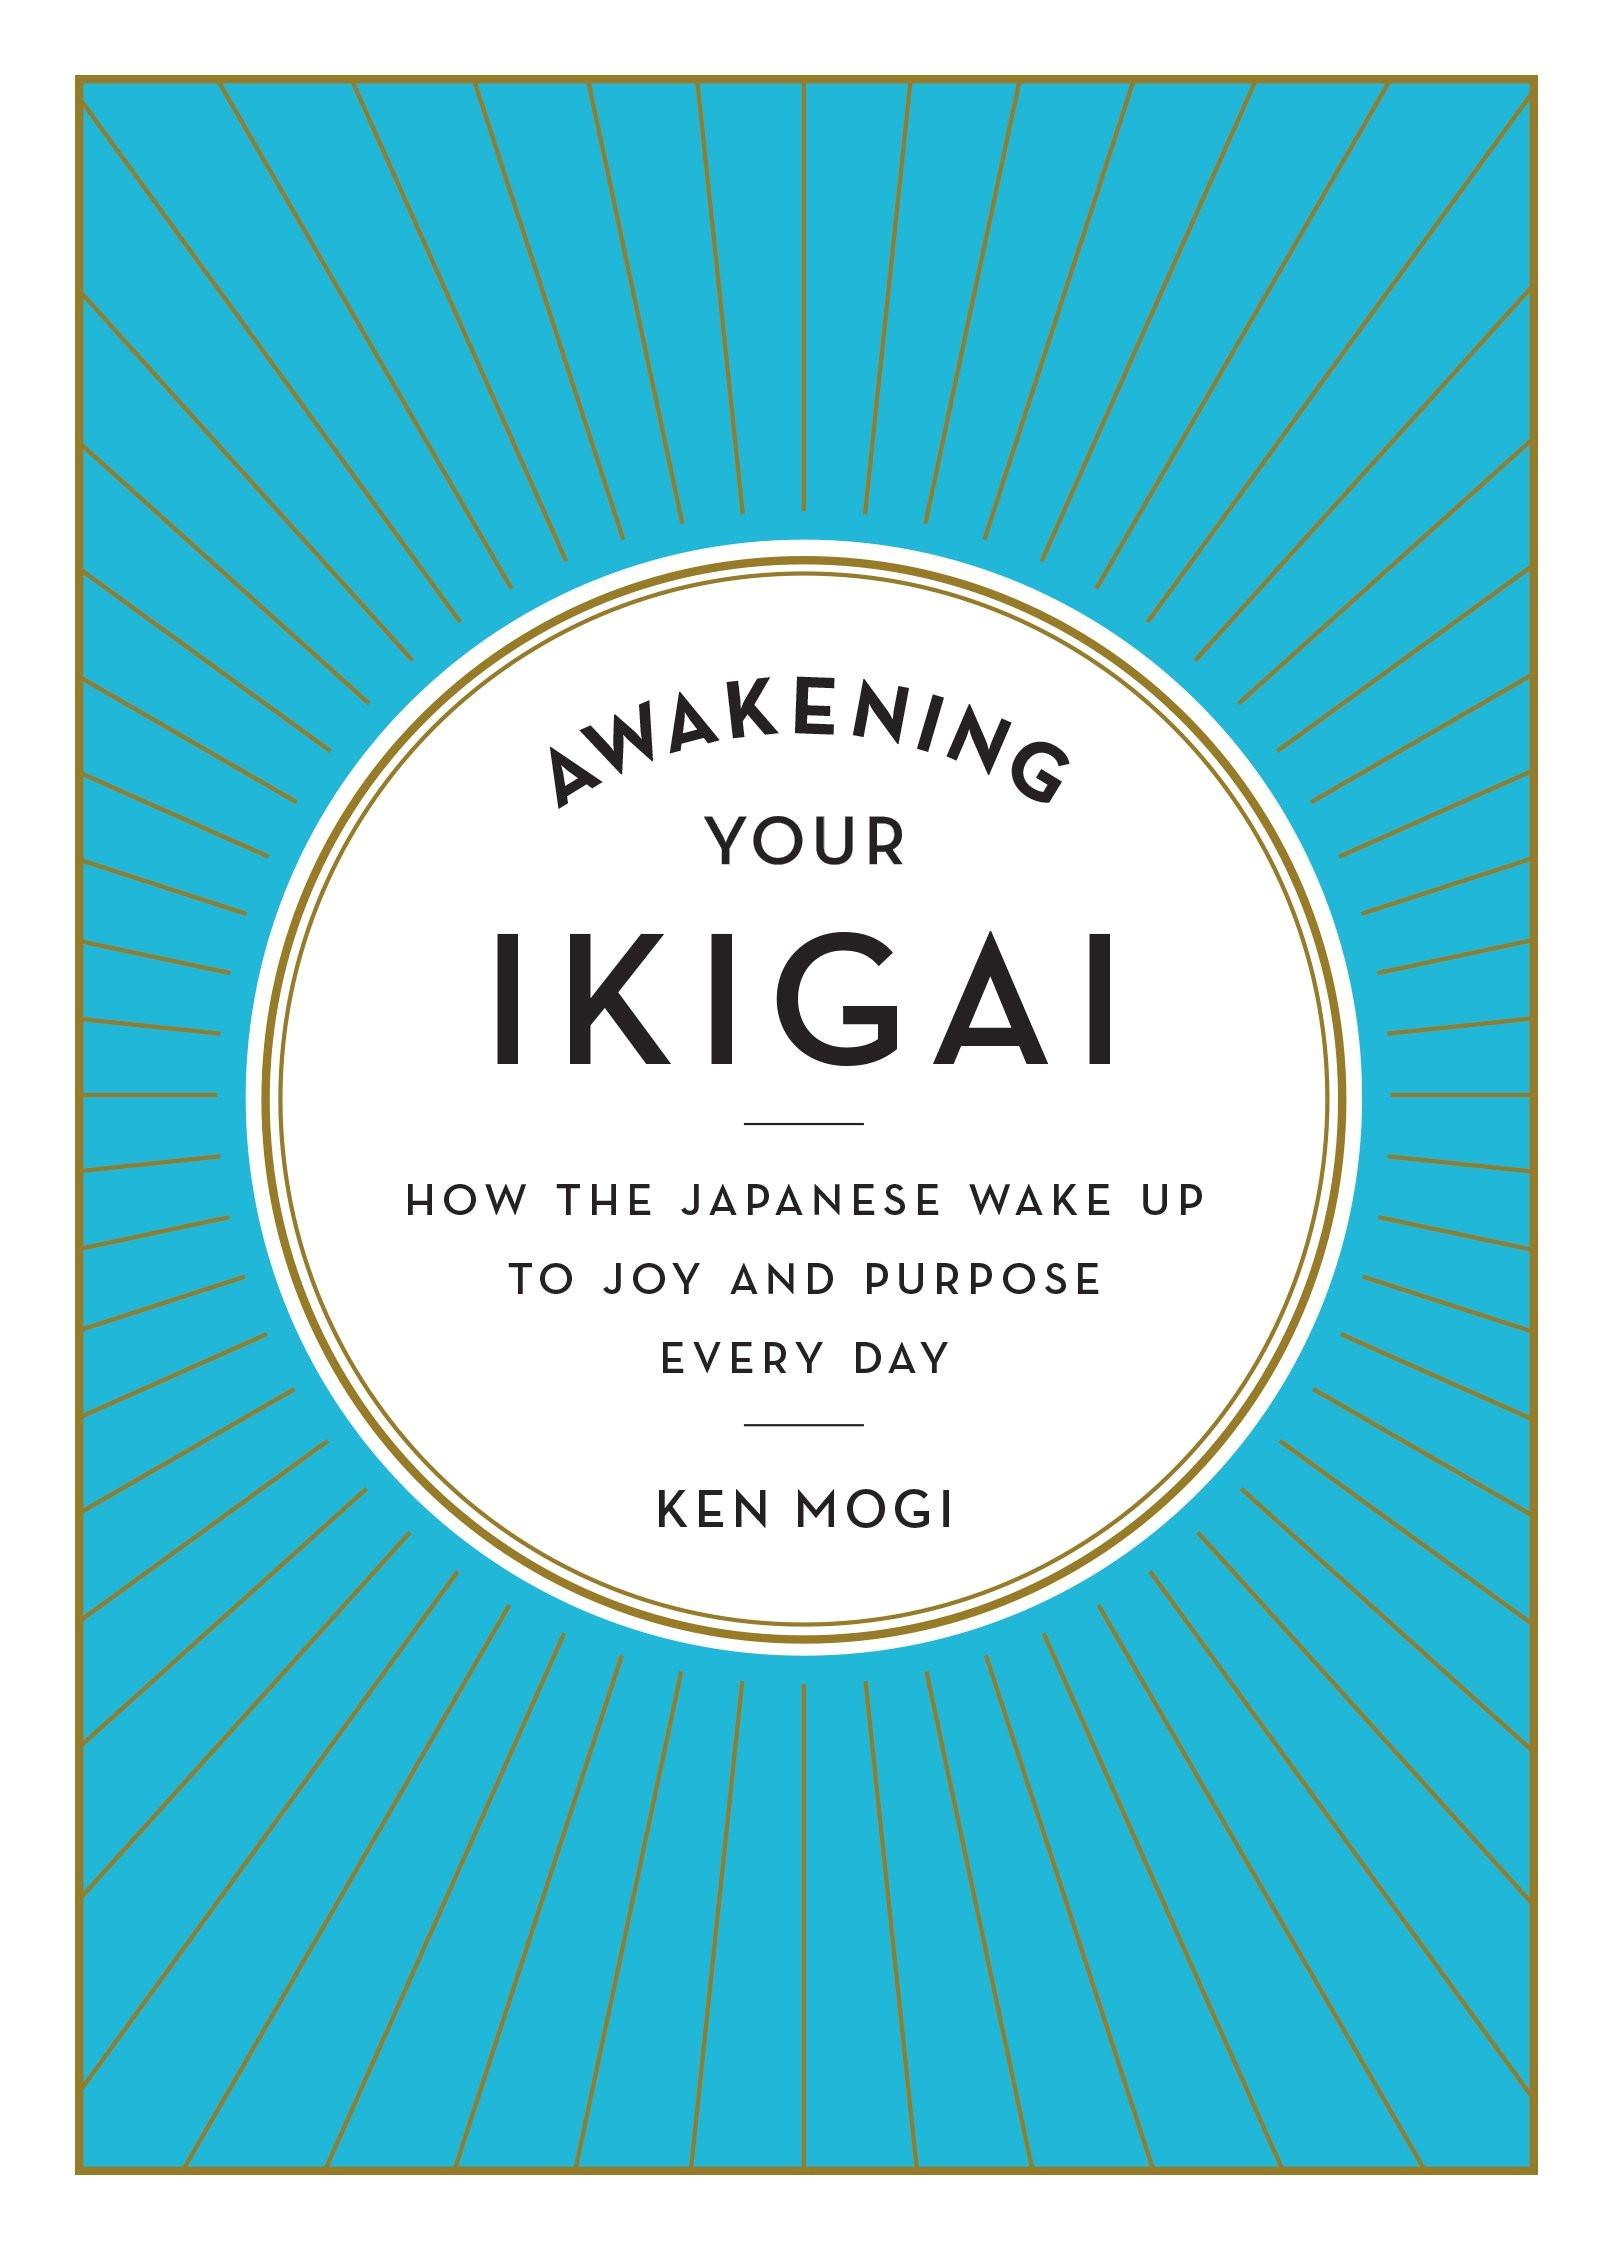 amazon com awakening your ikigai how the japanese wake up to joy and purpose every day 9781615194759 ken mogi books